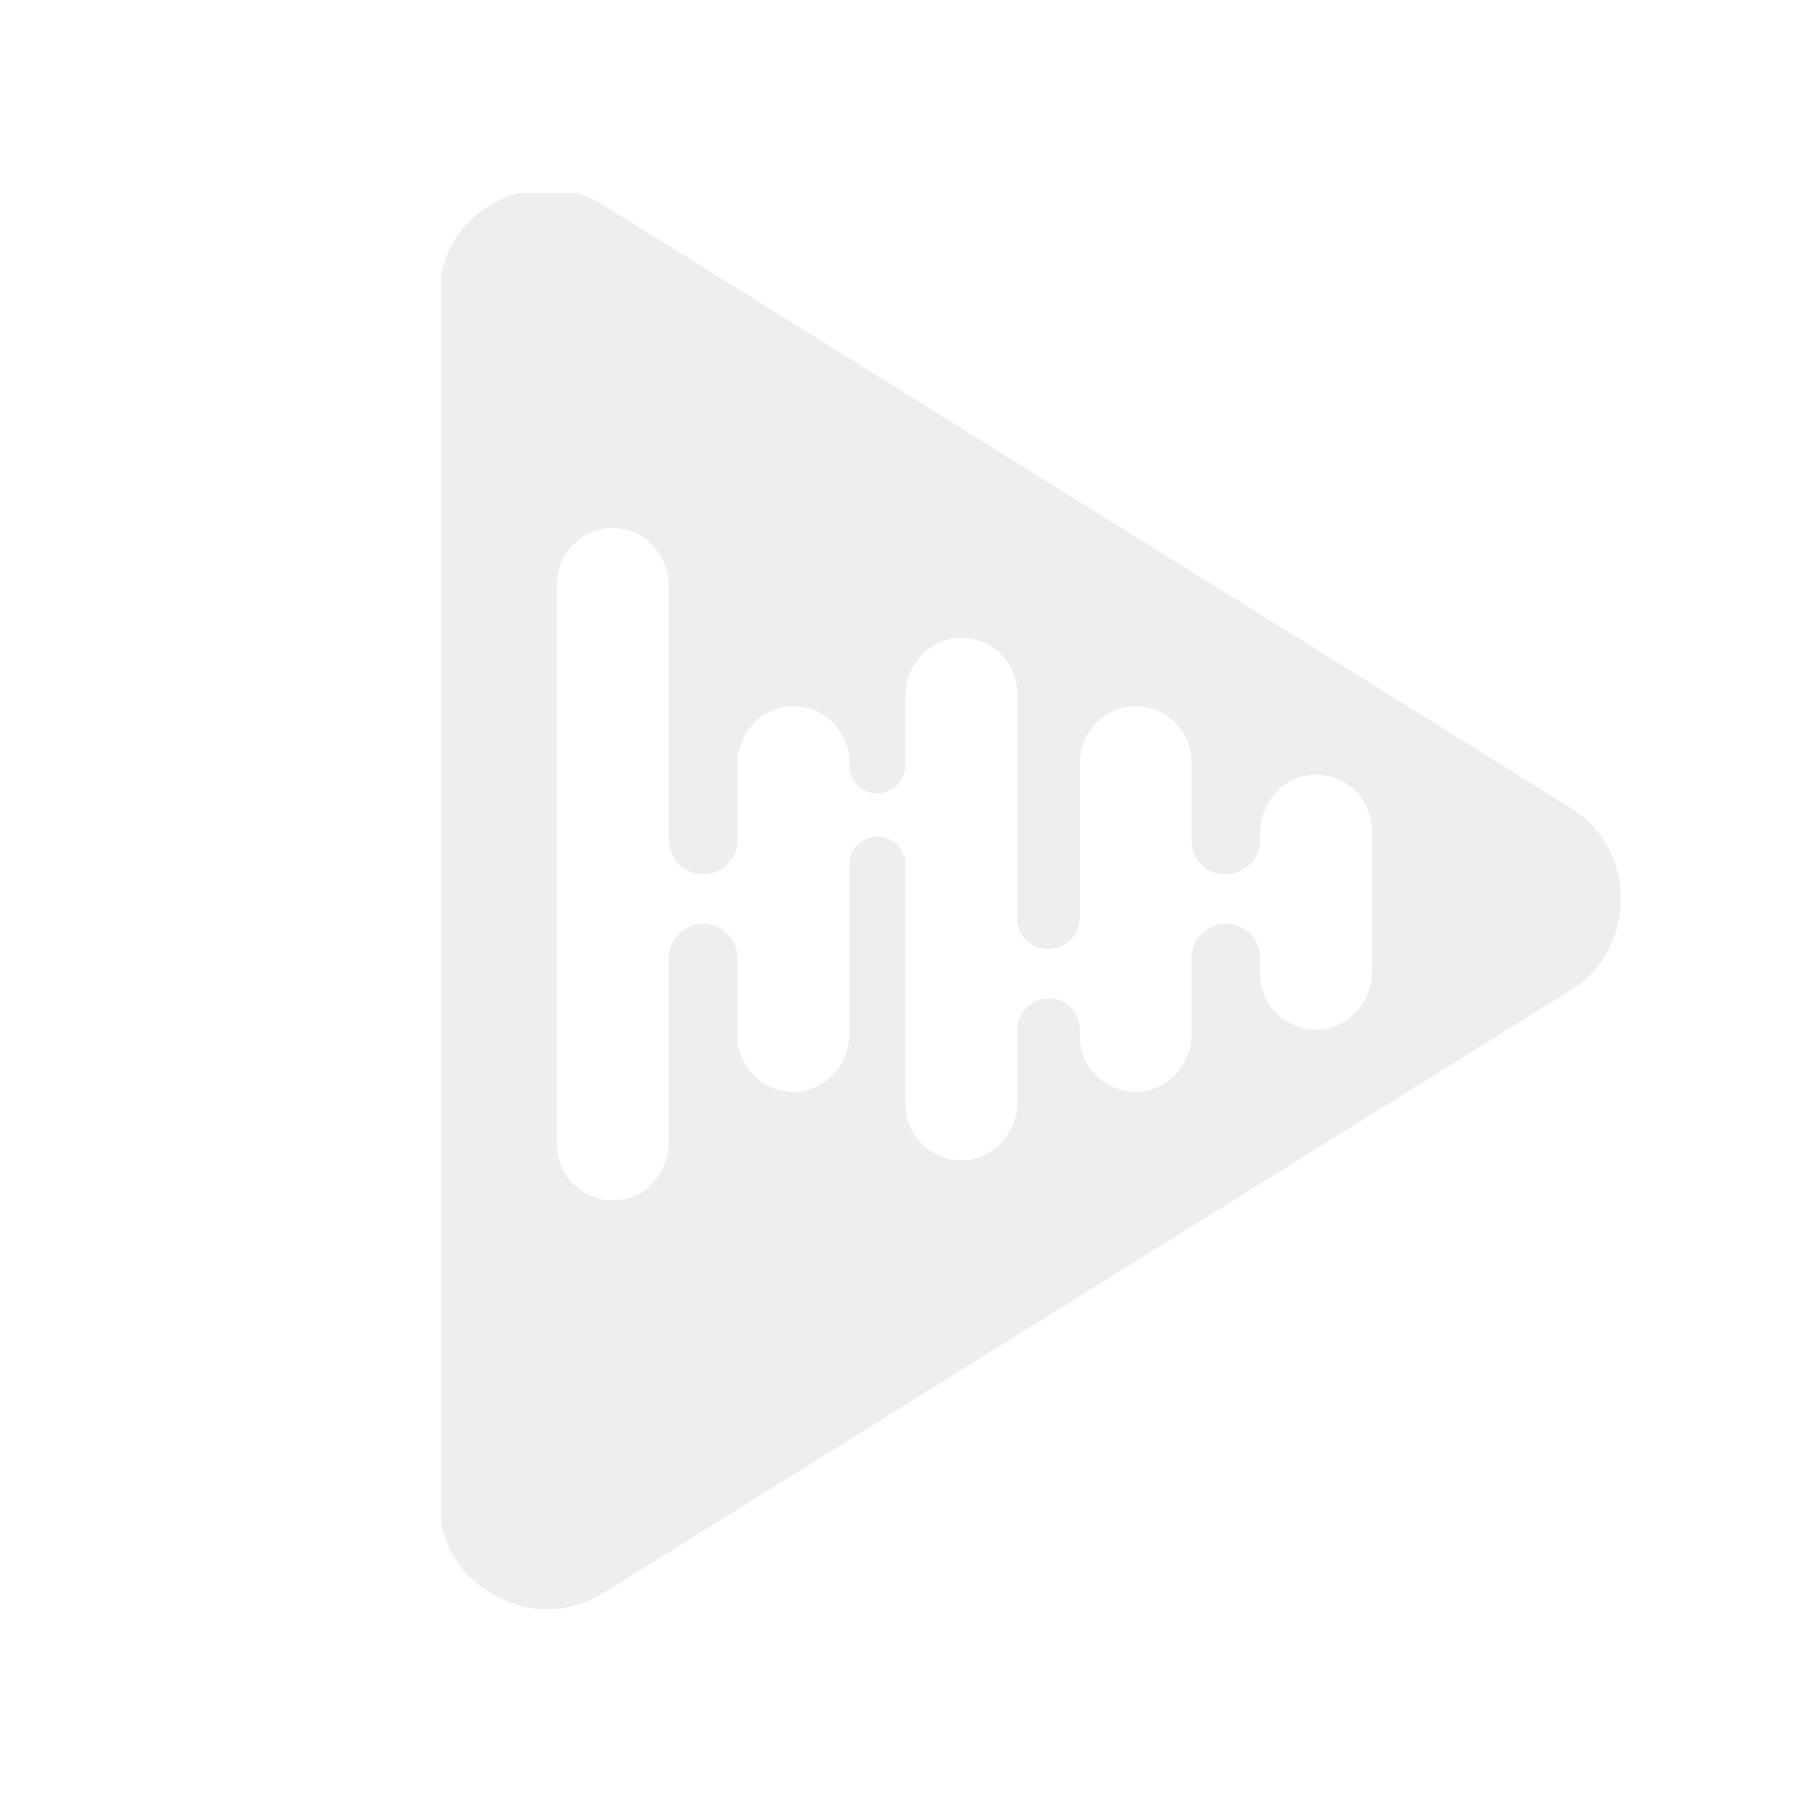 Autodab SWC C2DAB-HY4